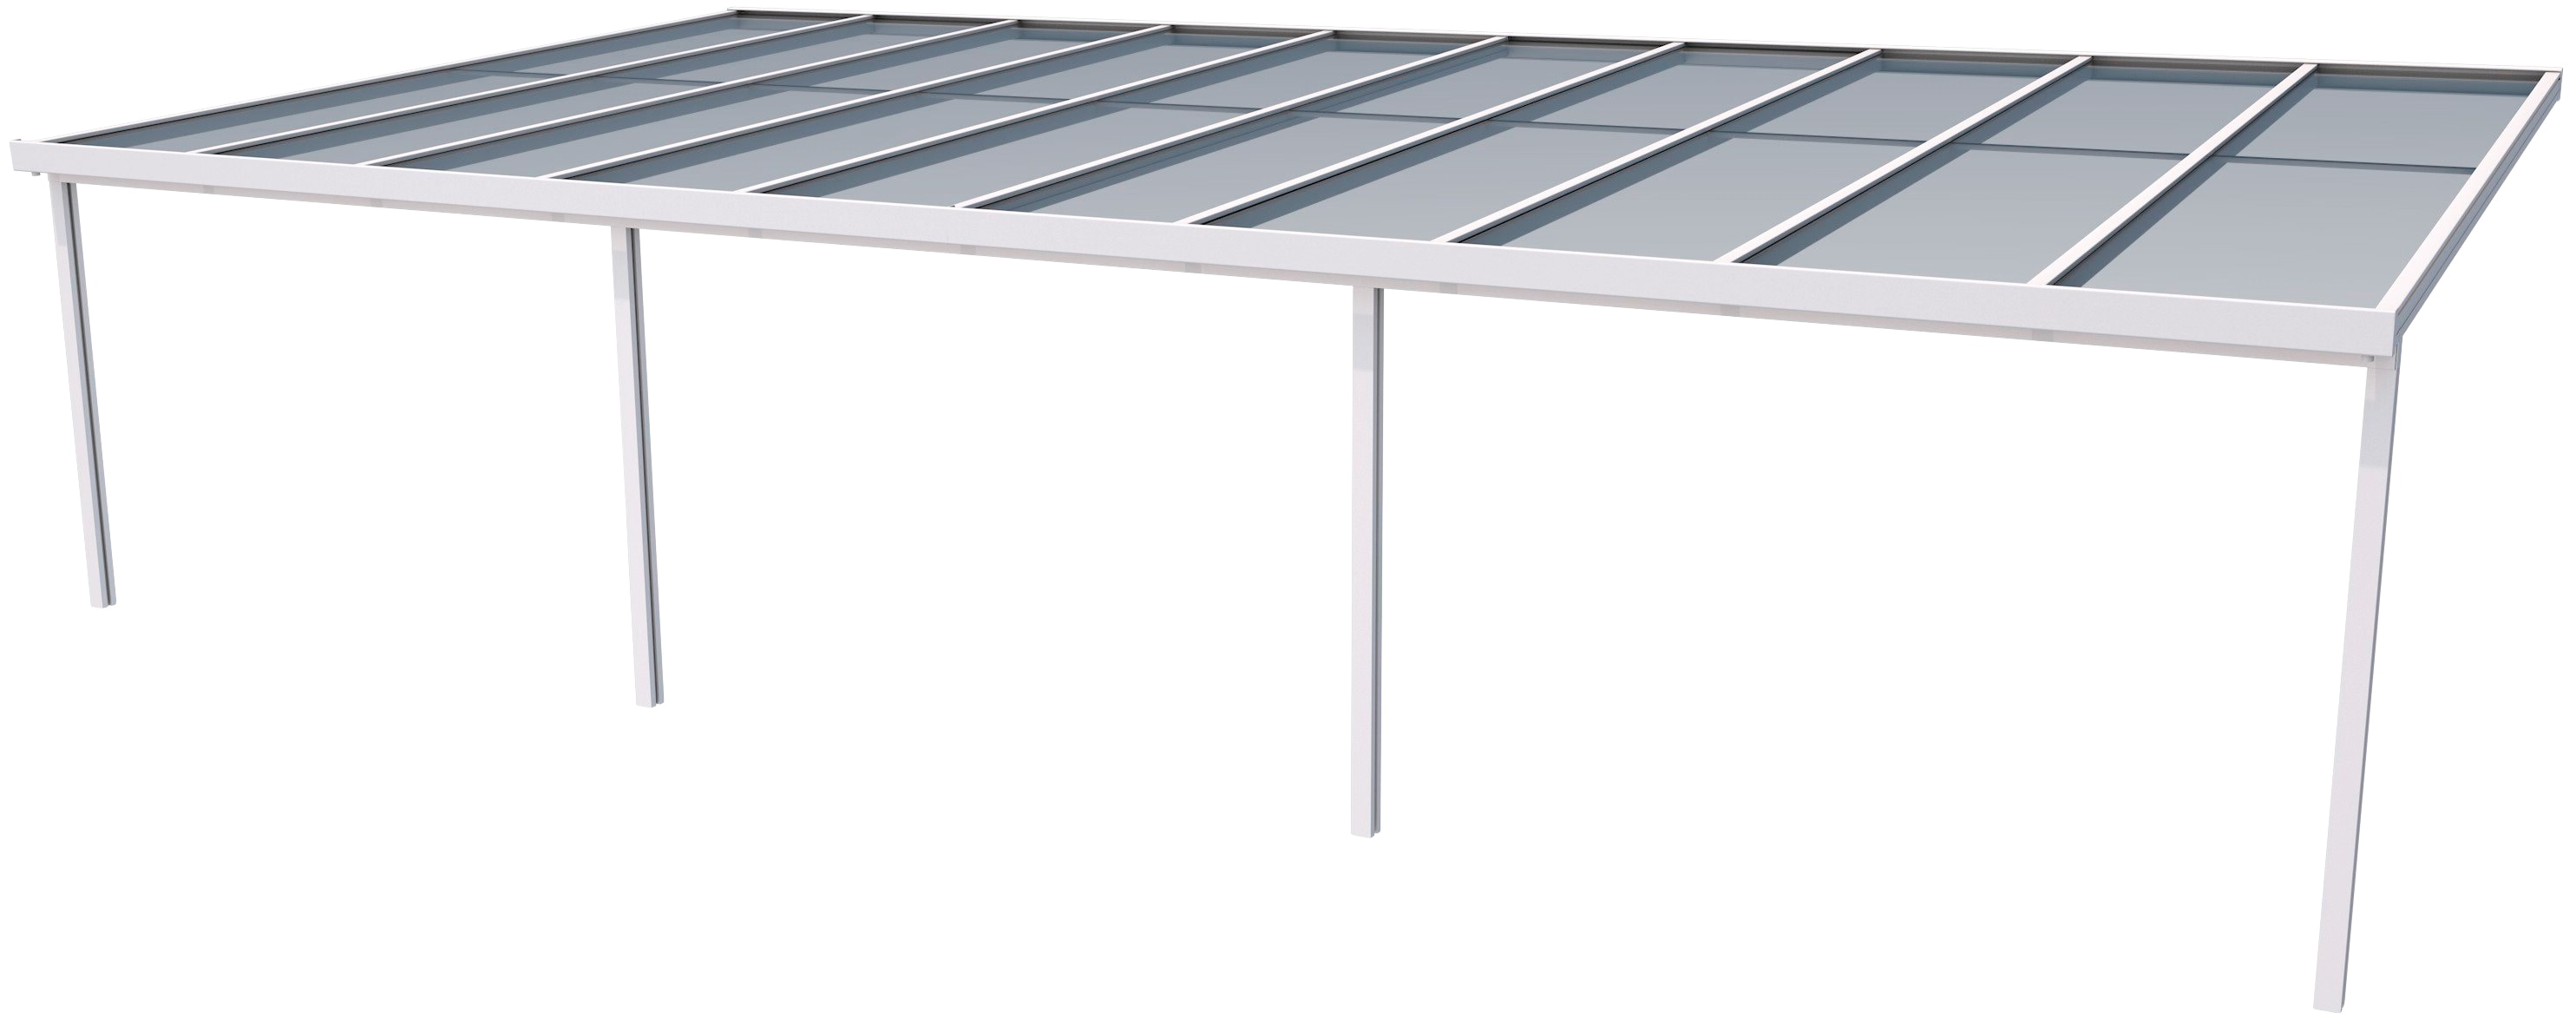 gutta terrassendach premium bxt 1014x506 cm dach acryl klima blue - GUTTA Terrassendach Premium, BxT: 1014x506 cm, Dach Acryl Klima blue , Gutta